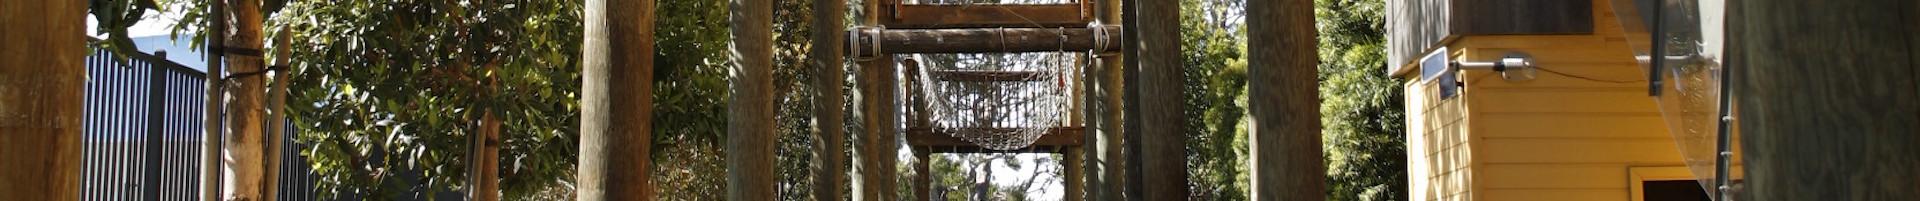 Ropes Course Adventureplex